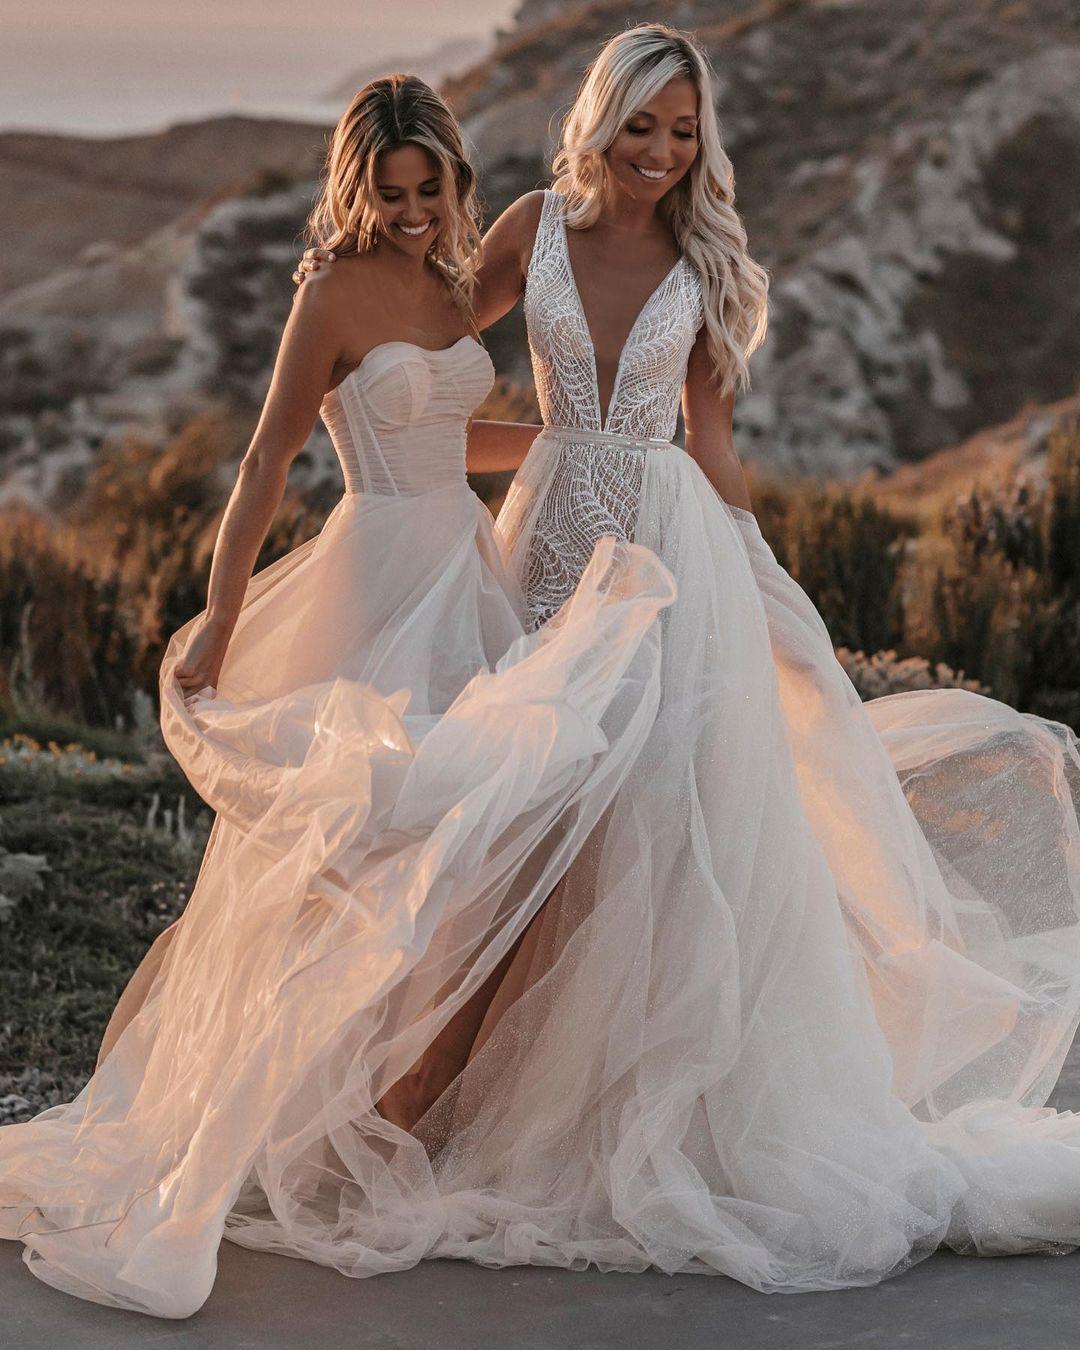 Galia Lahav A Line And Mermaid Wedding Dresses Wedding Gowns Mermaid Wedding Dresses Strapless Trumpet Style Wedding Dress [ 1350 x 1080 Pixel ]